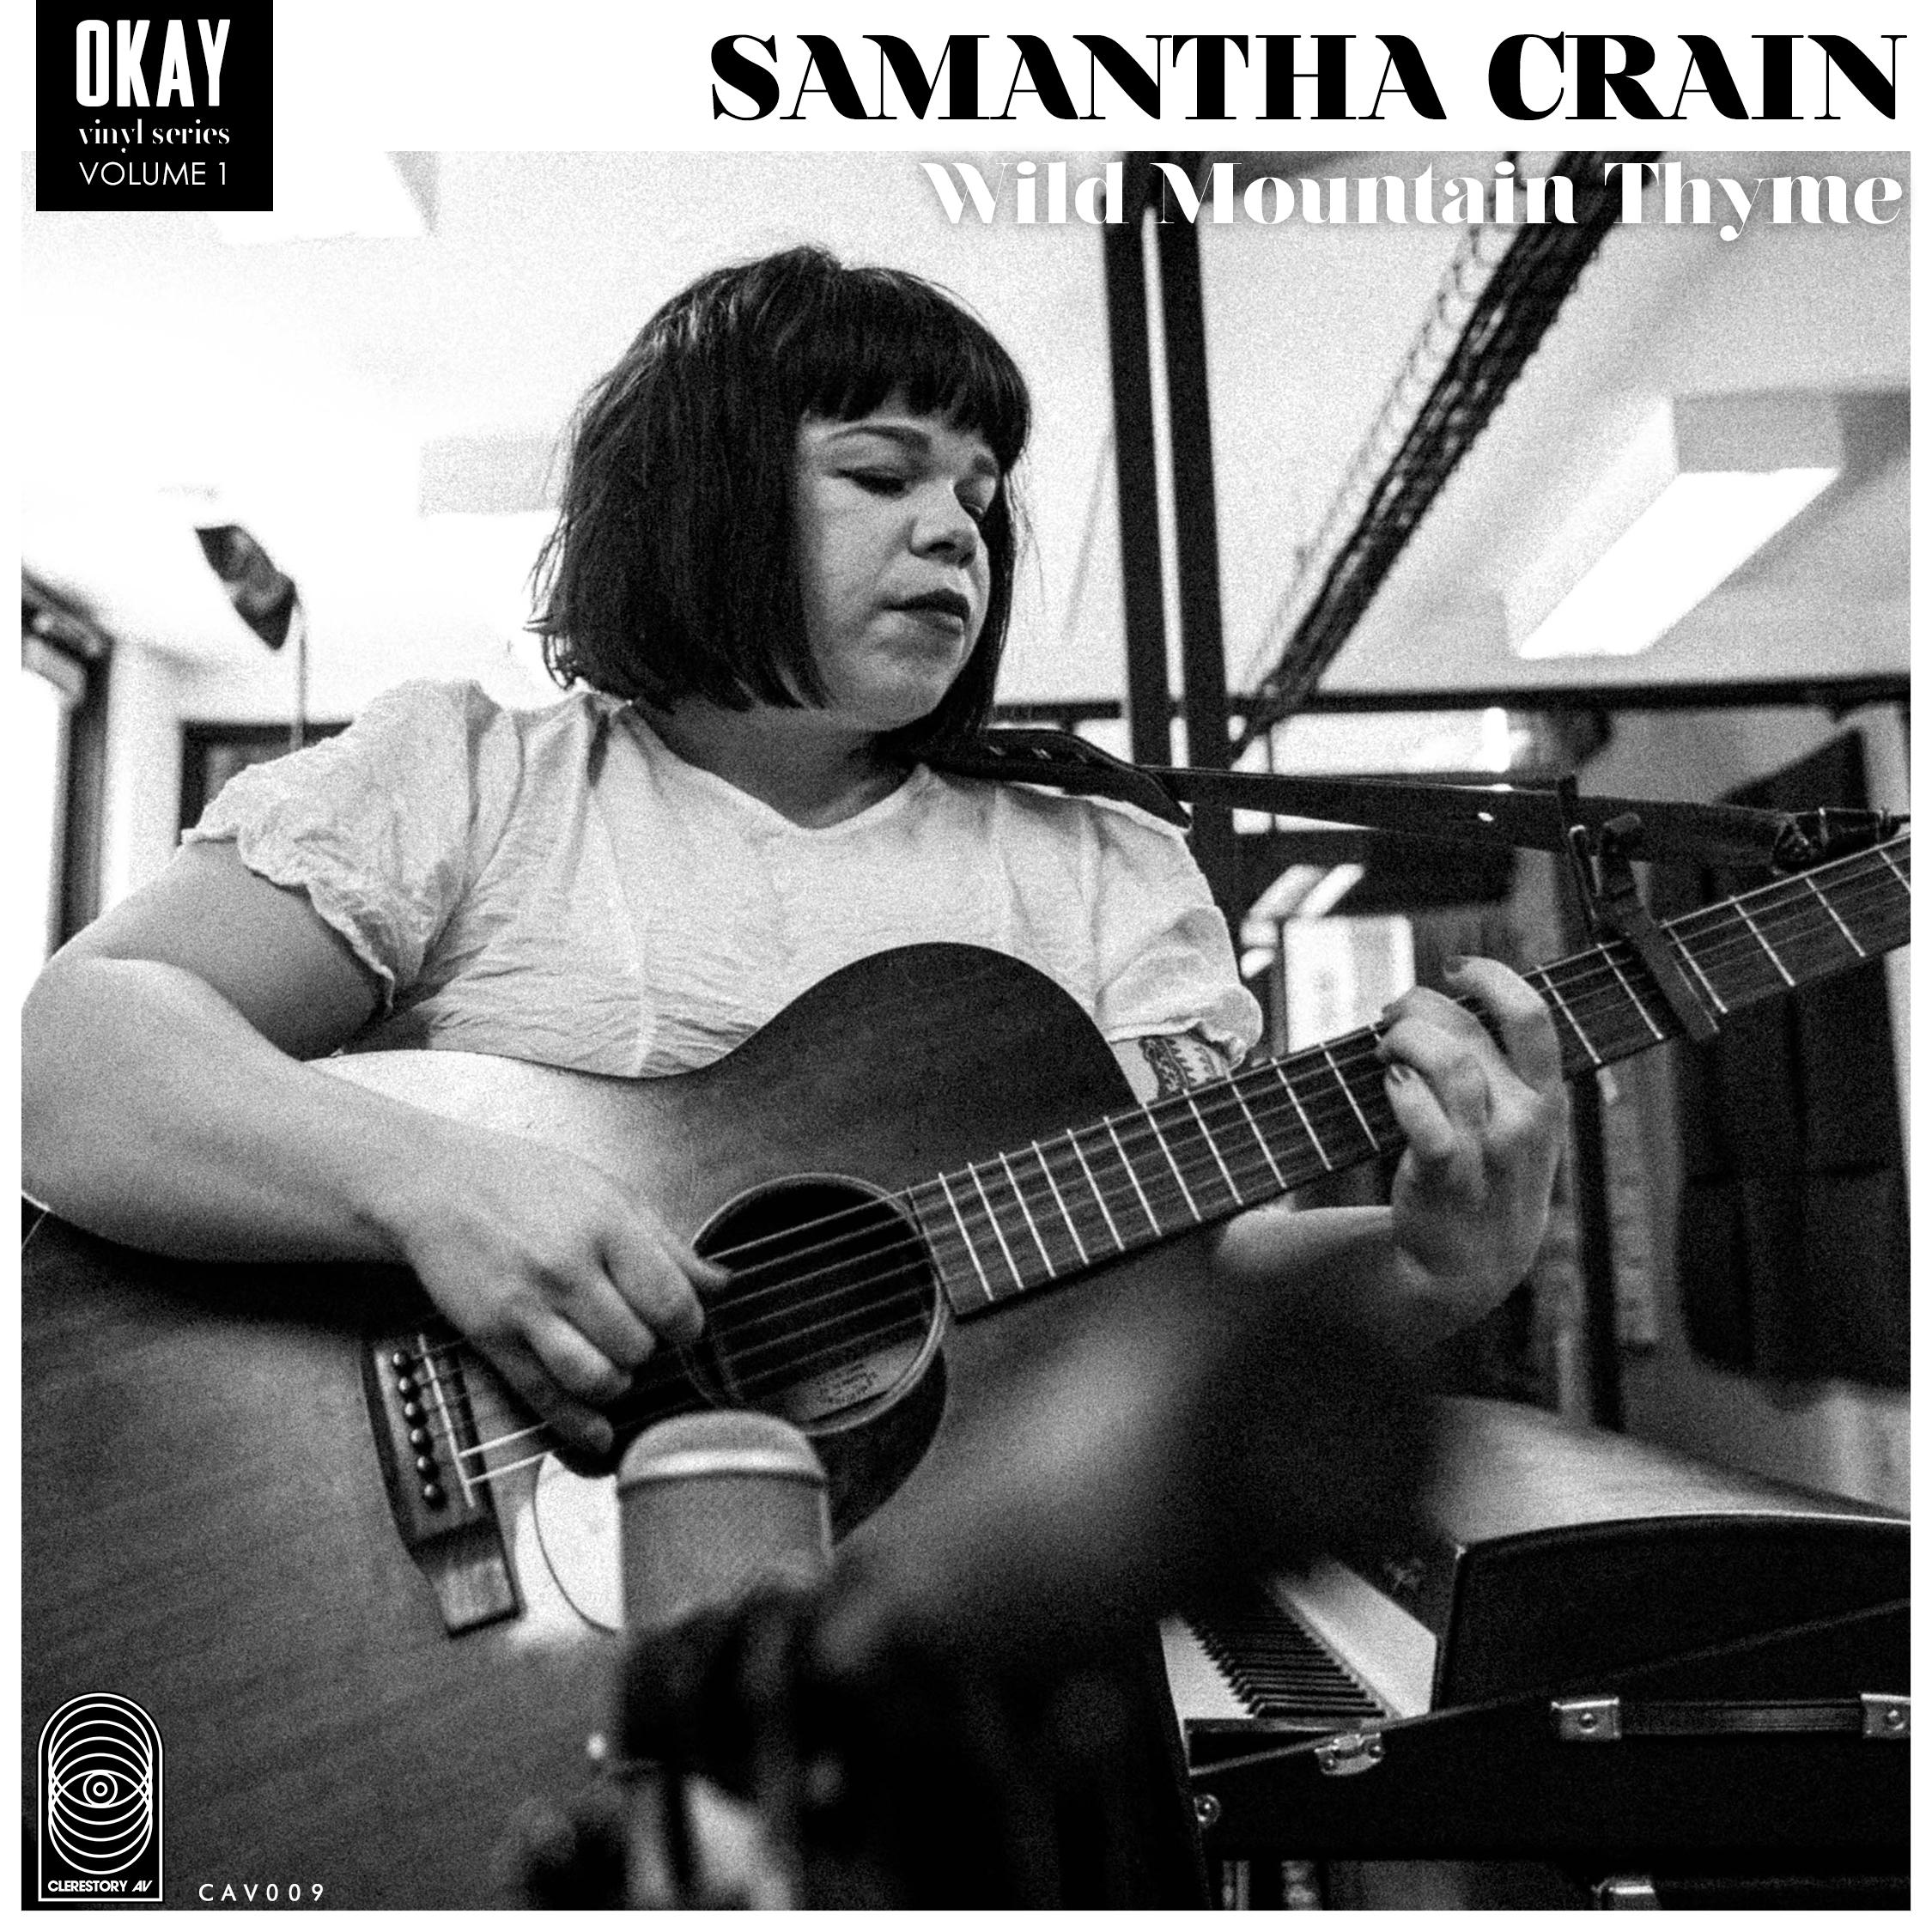 SAMANTHA CRAIN / OKAY Vinyl Series Vol. 1